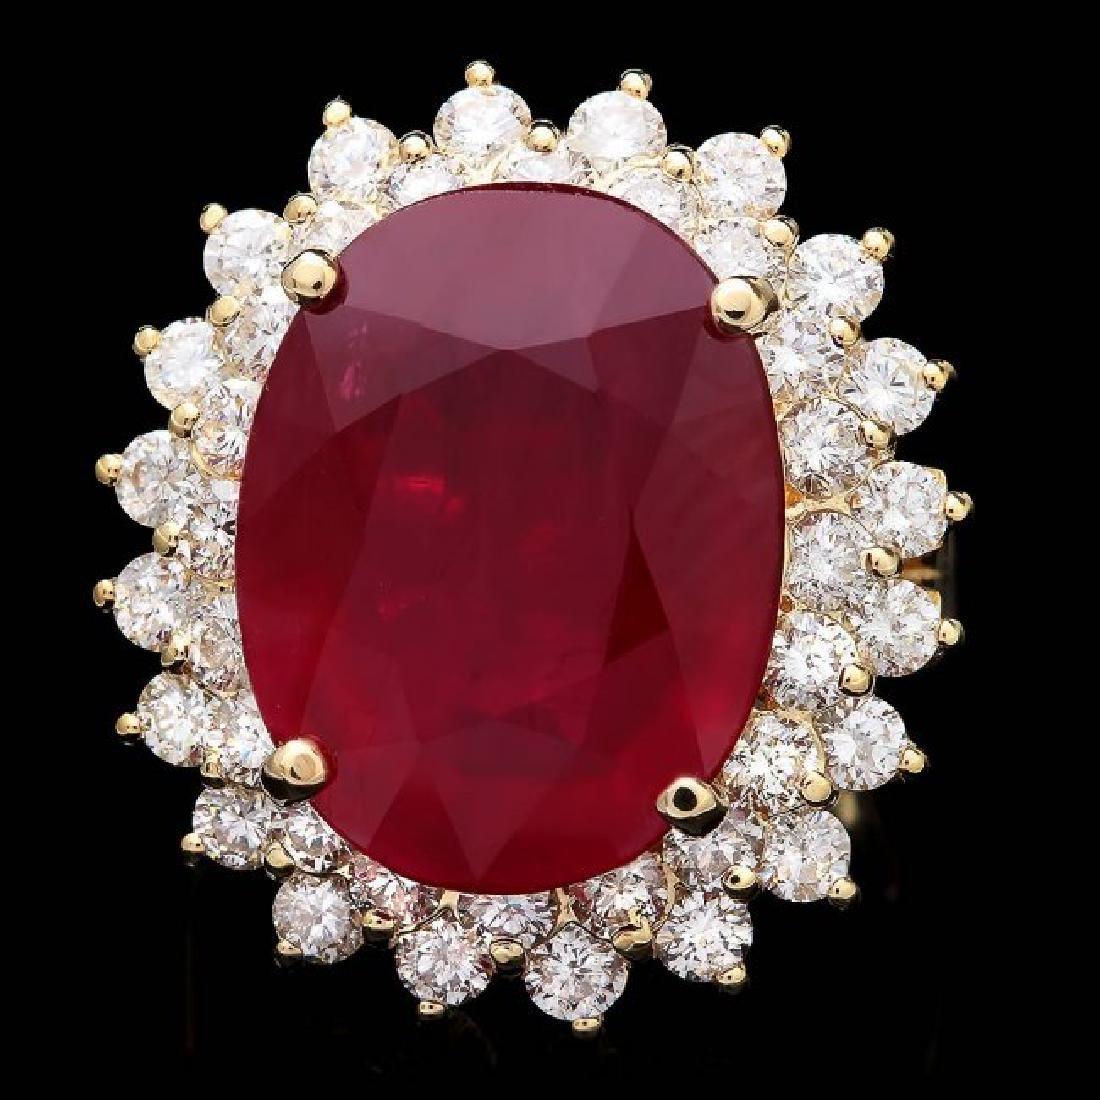 14k Yellow Gold 18.00ct Ruby 2.40ct Diamond Ring